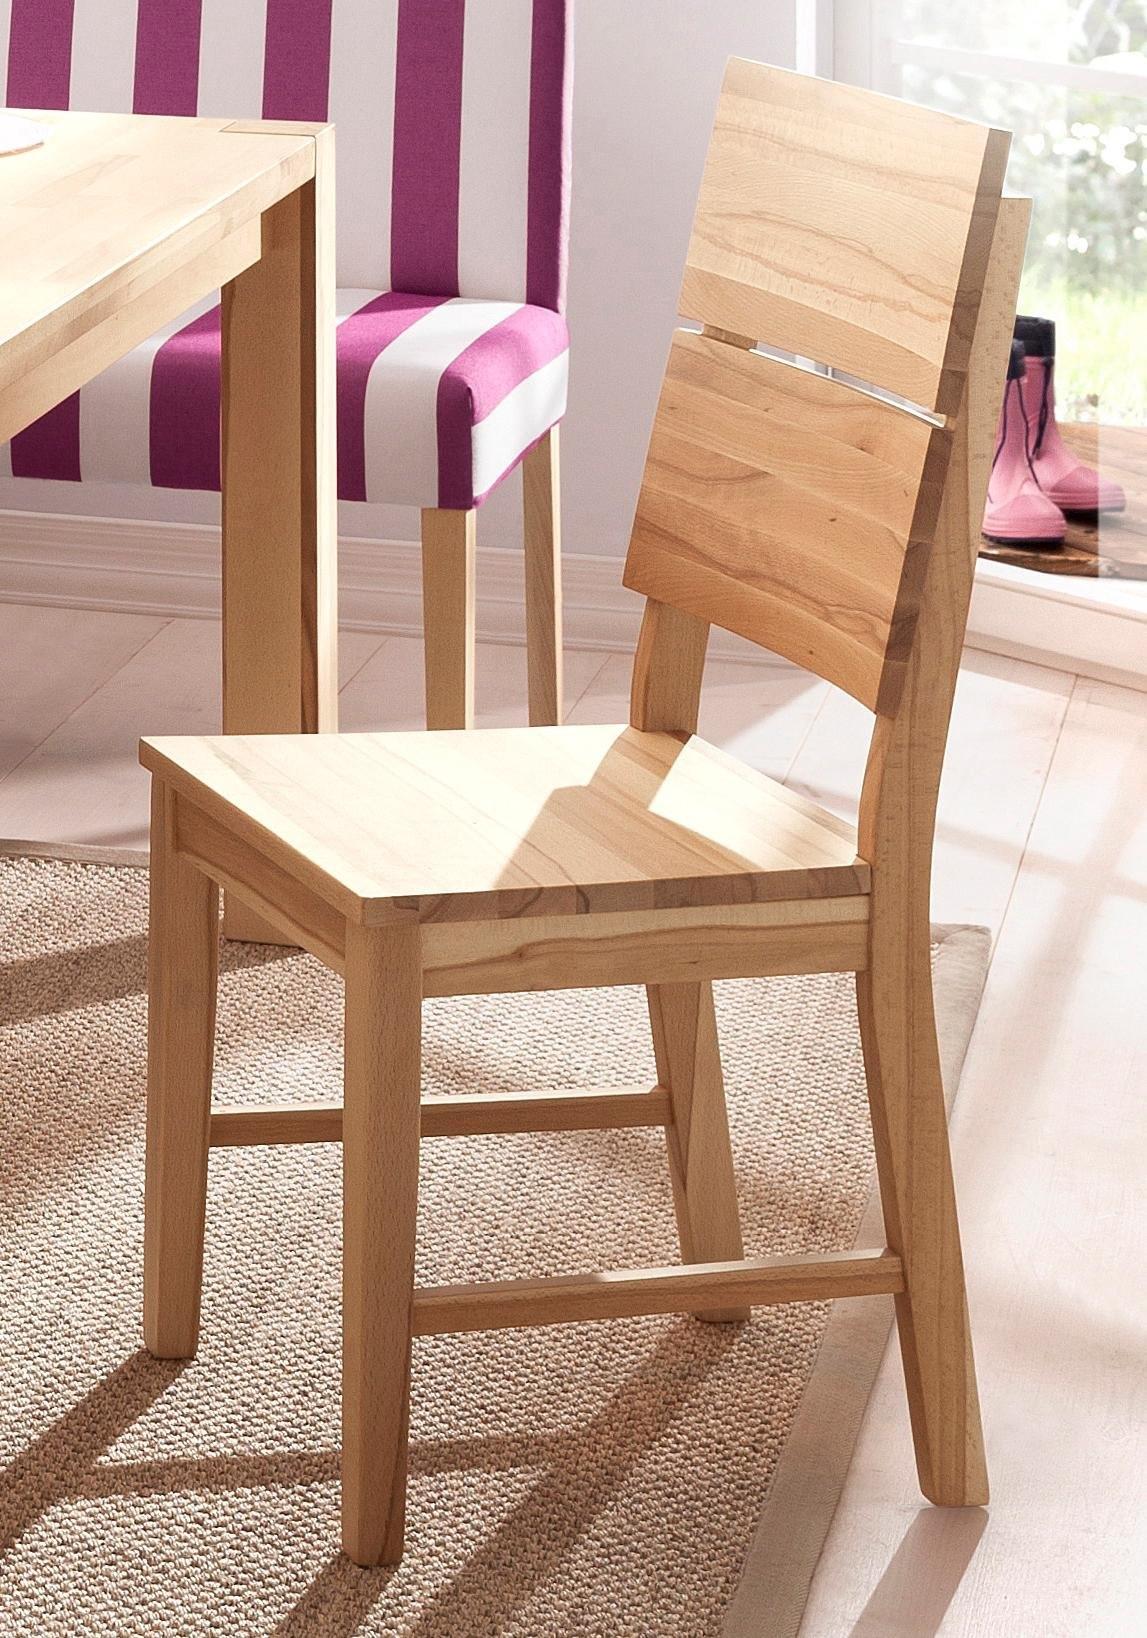 home affaire stoel nico met armleuning set van 2 home affaire stoel van massief grenen in set van 2 home affaire stoel victorie in set van